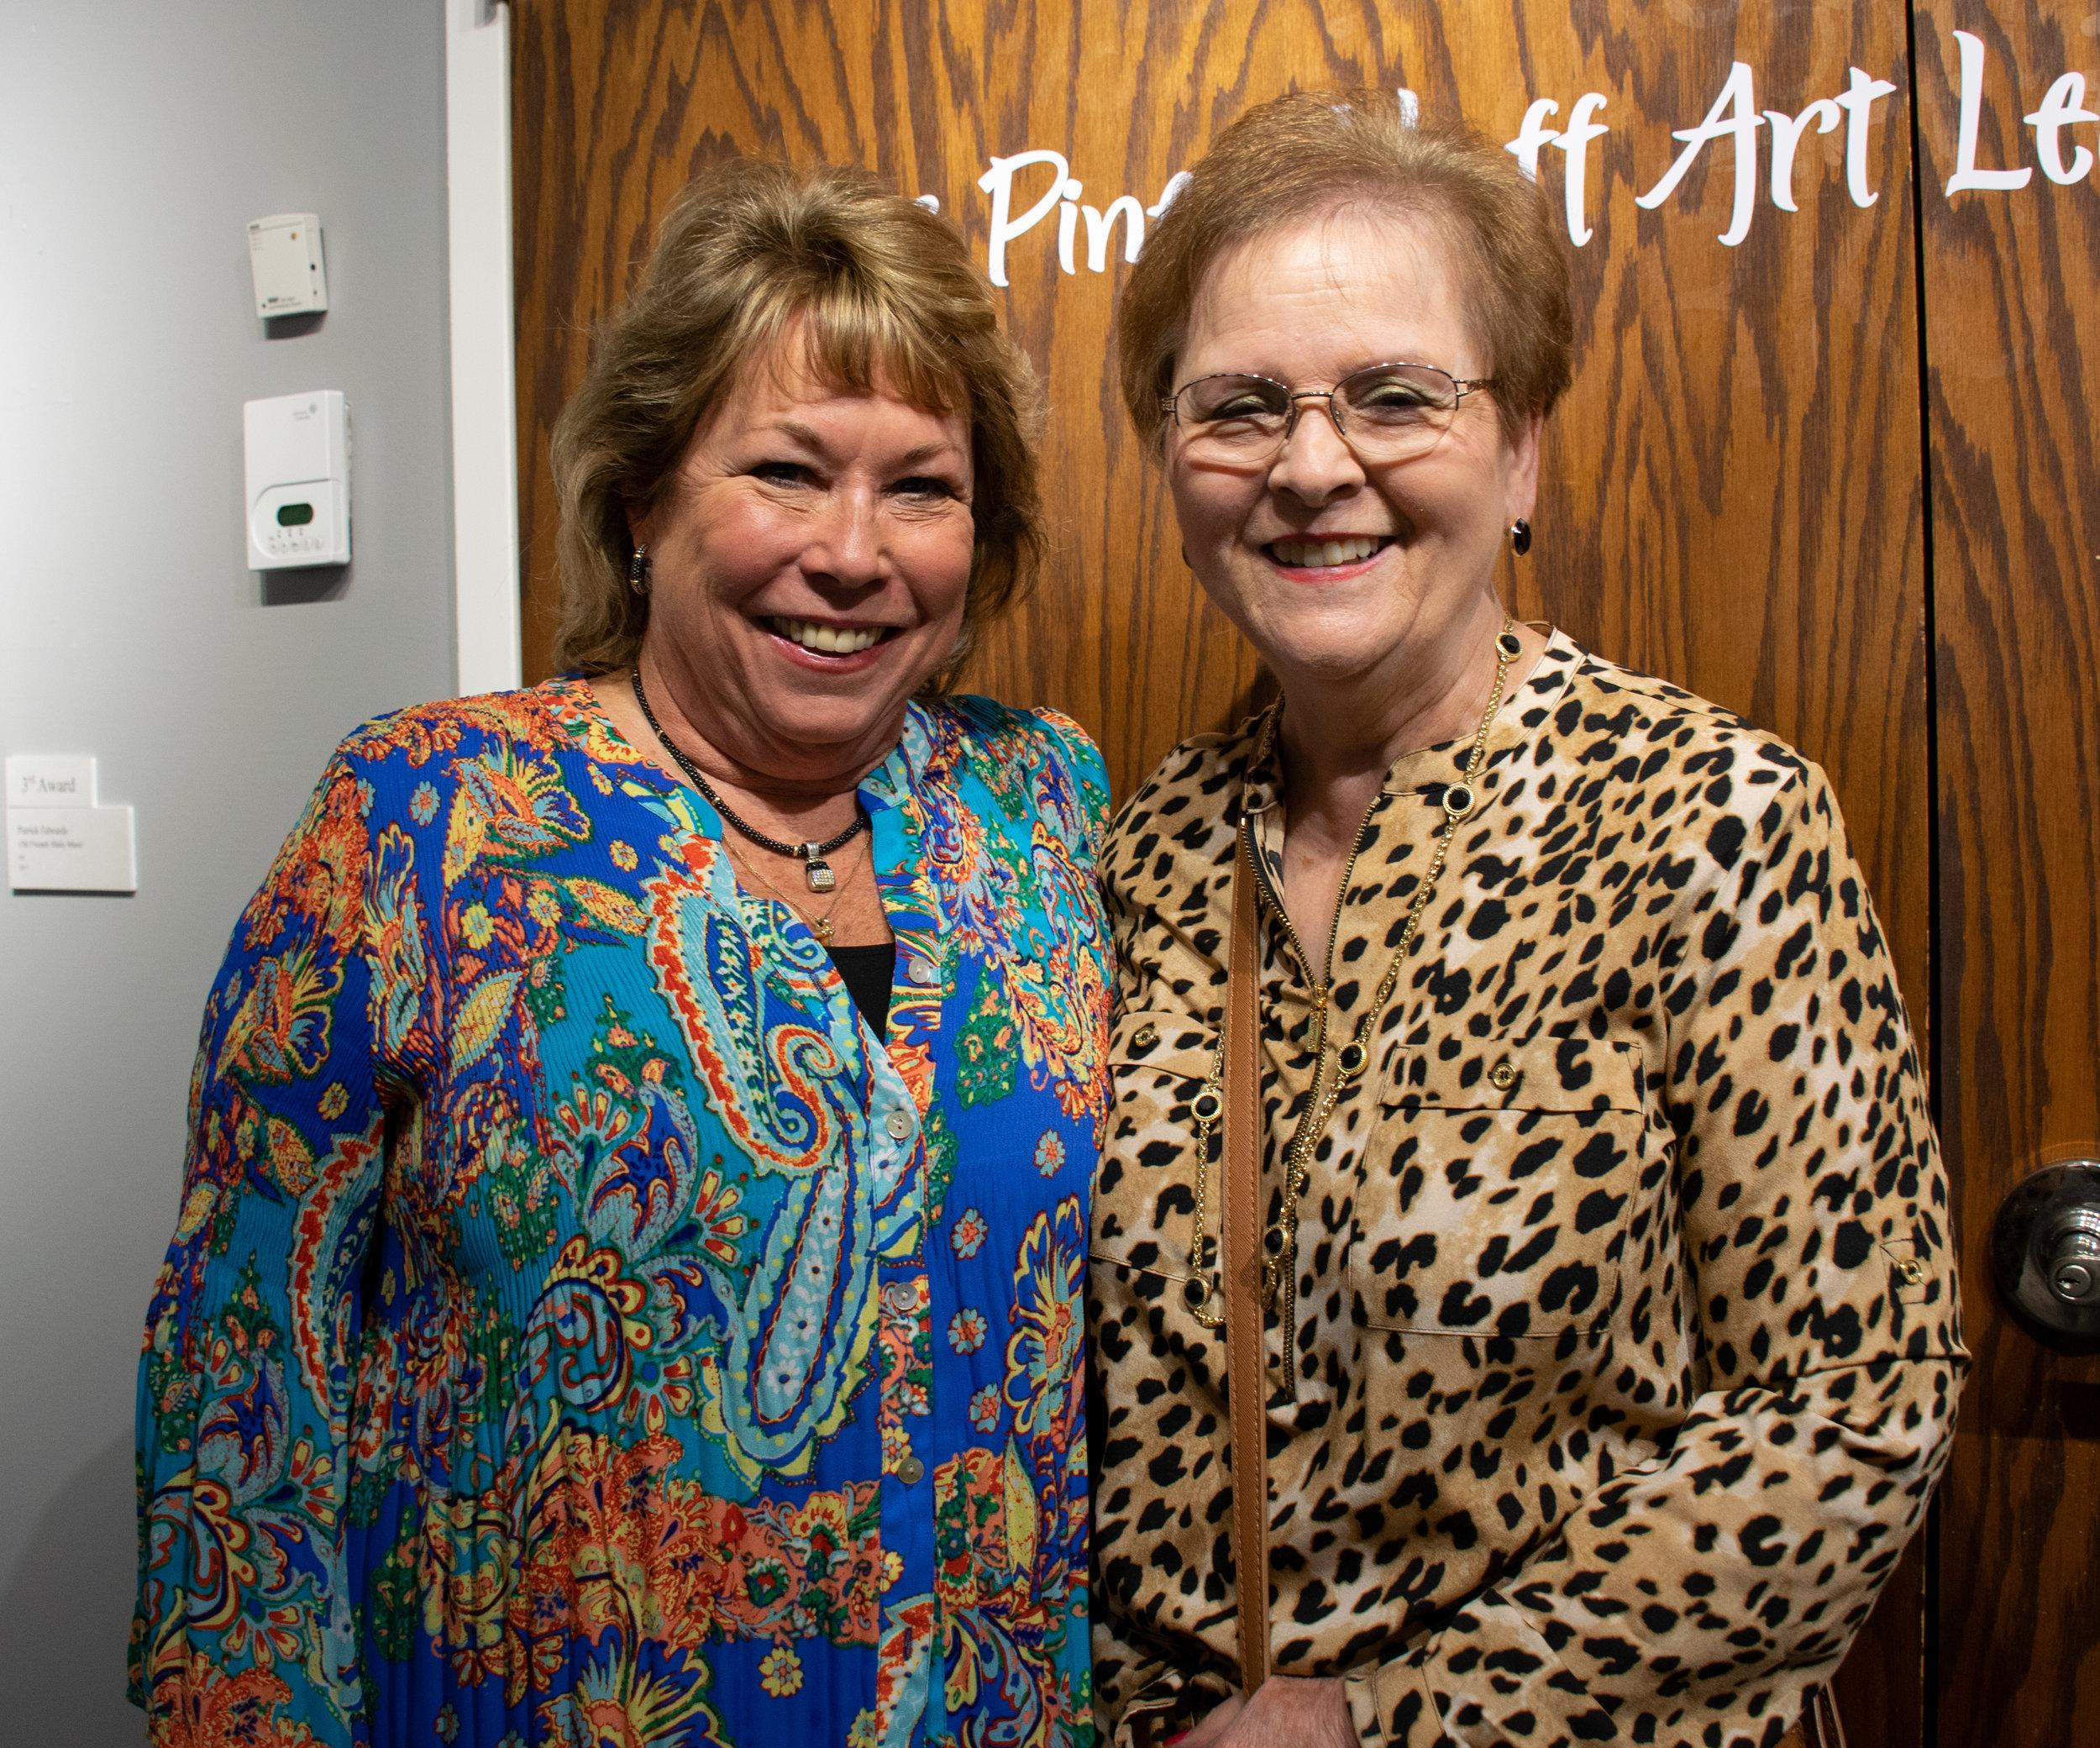 2018 Pine Bluff Art League Juried Exhibition Chair Melissa Abernathy (left) and Pine Bluff Art League President Vickie Coleman.